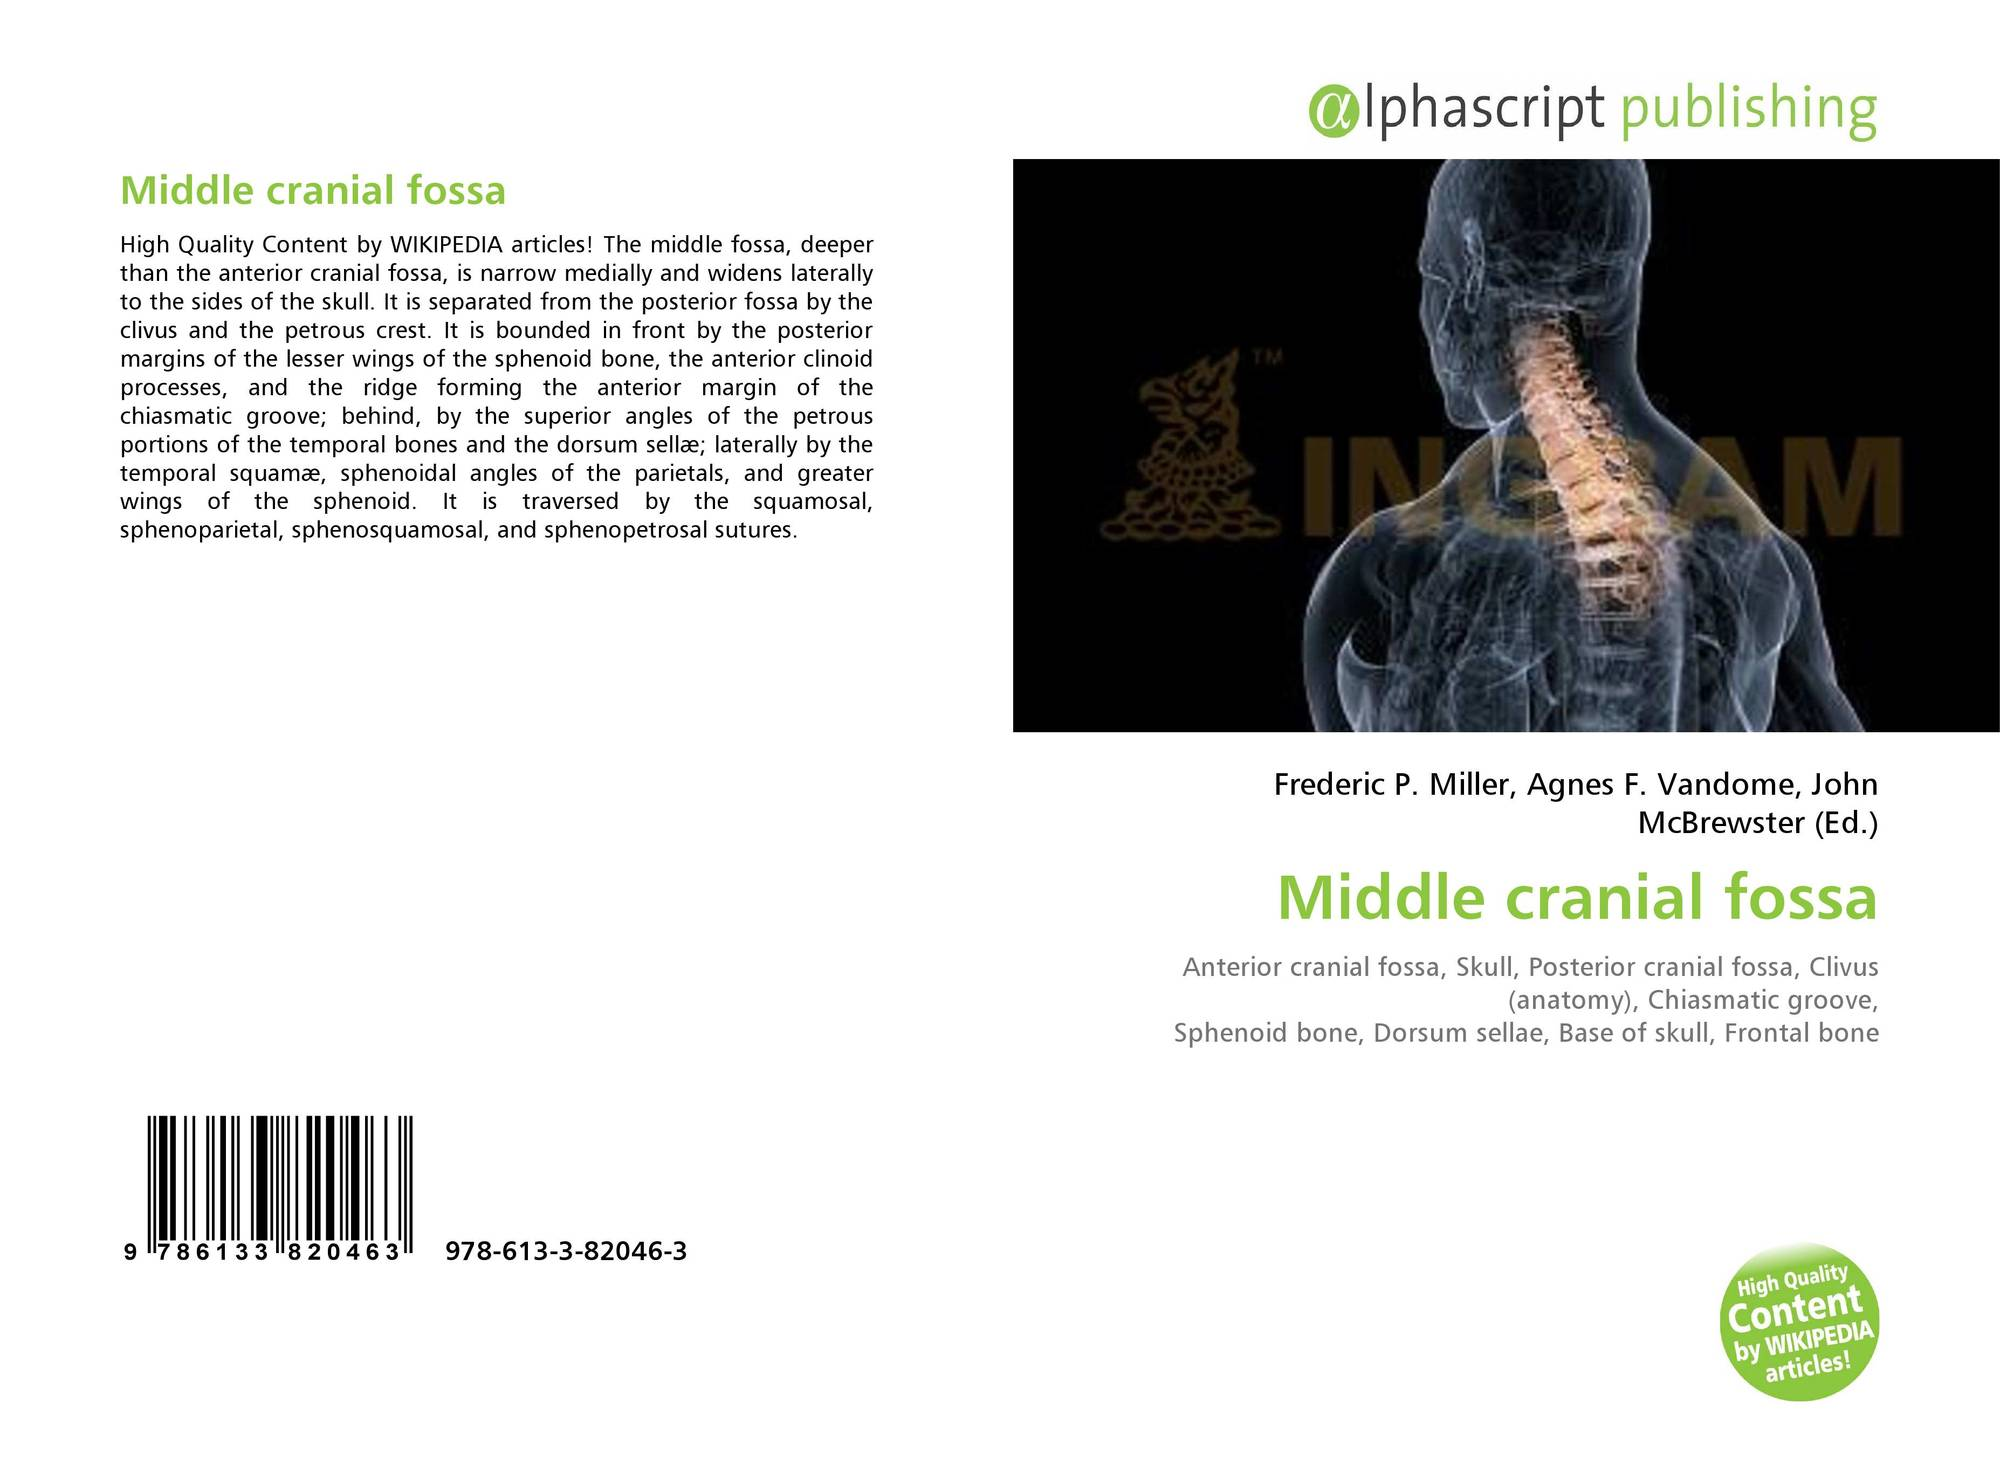 Middle Cranial Fossa 978 613 3 82046 3 6133820462 9786133820463